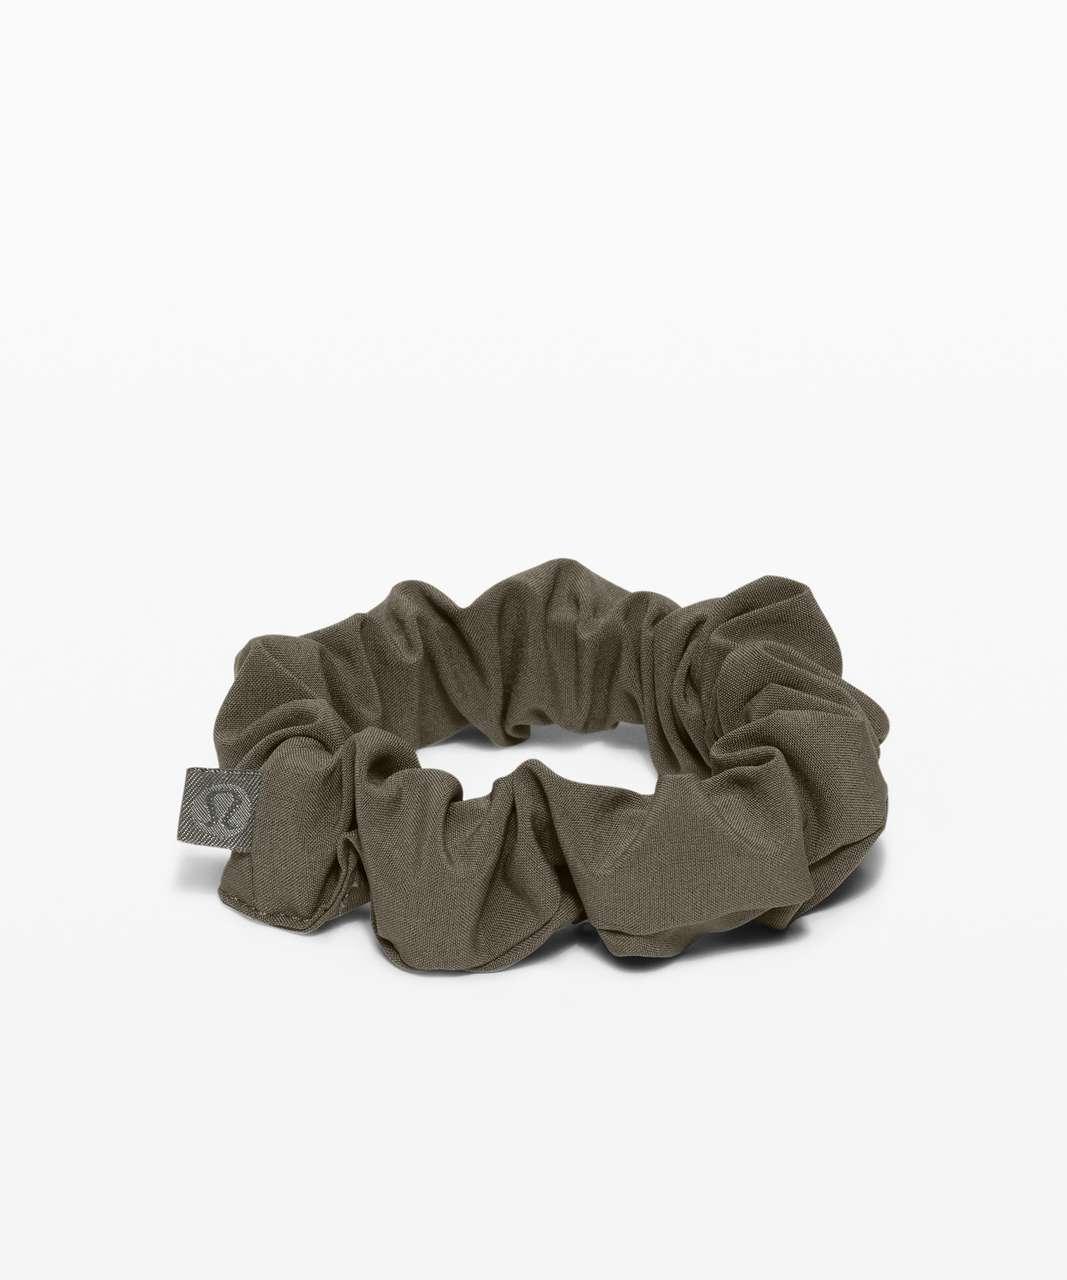 Lululemon Uplifting Scrunchie - Grey Sage